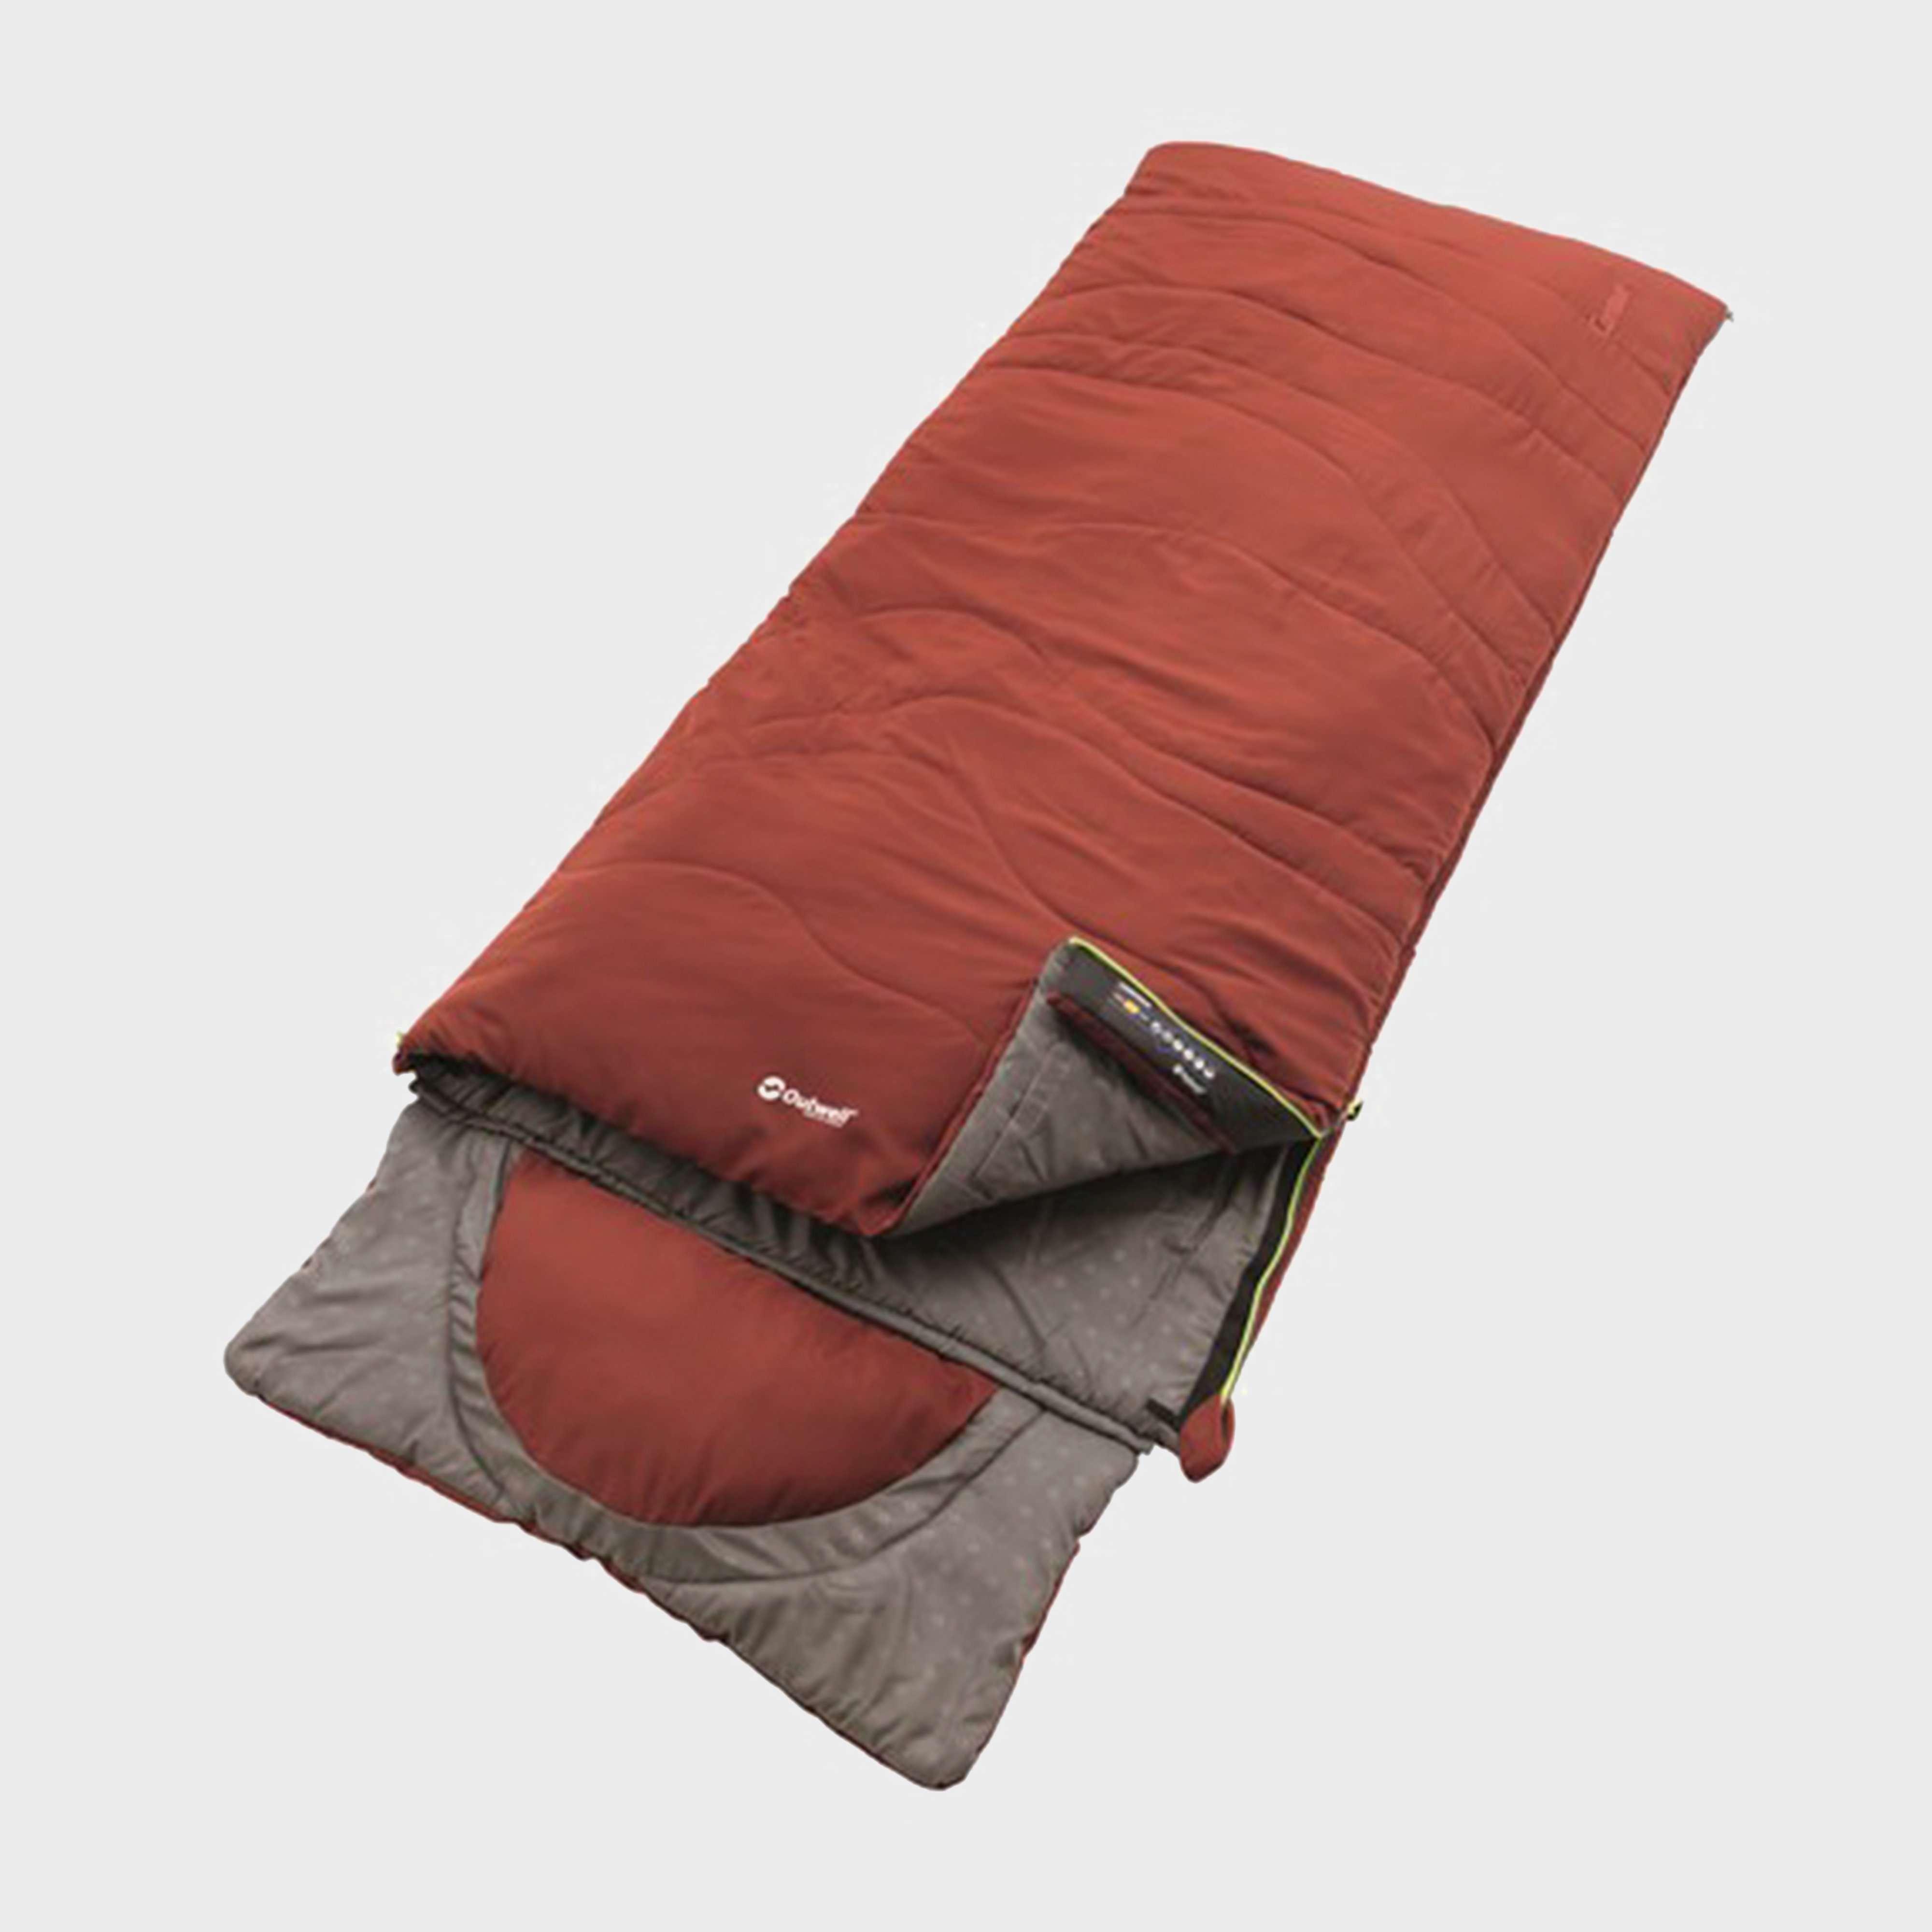 OUTWELL Contour Sleeping Bag